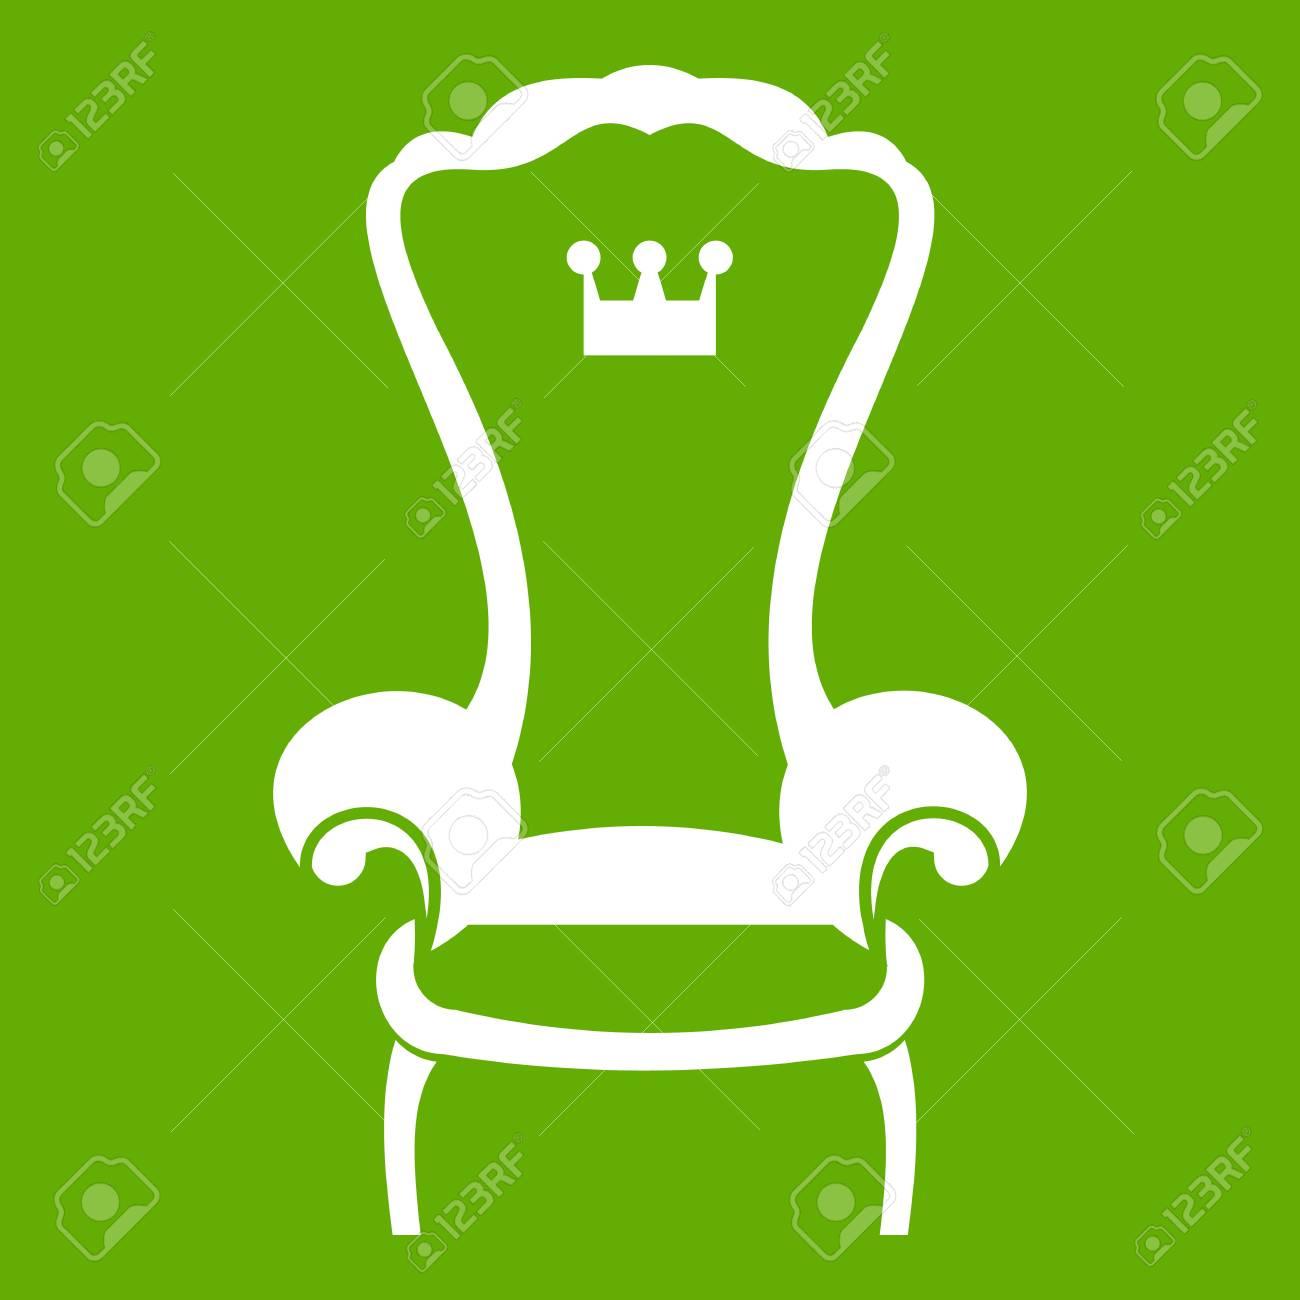 Icne De Chaise Trne Roi Blanc Isol Sur Fond Vert Illustration